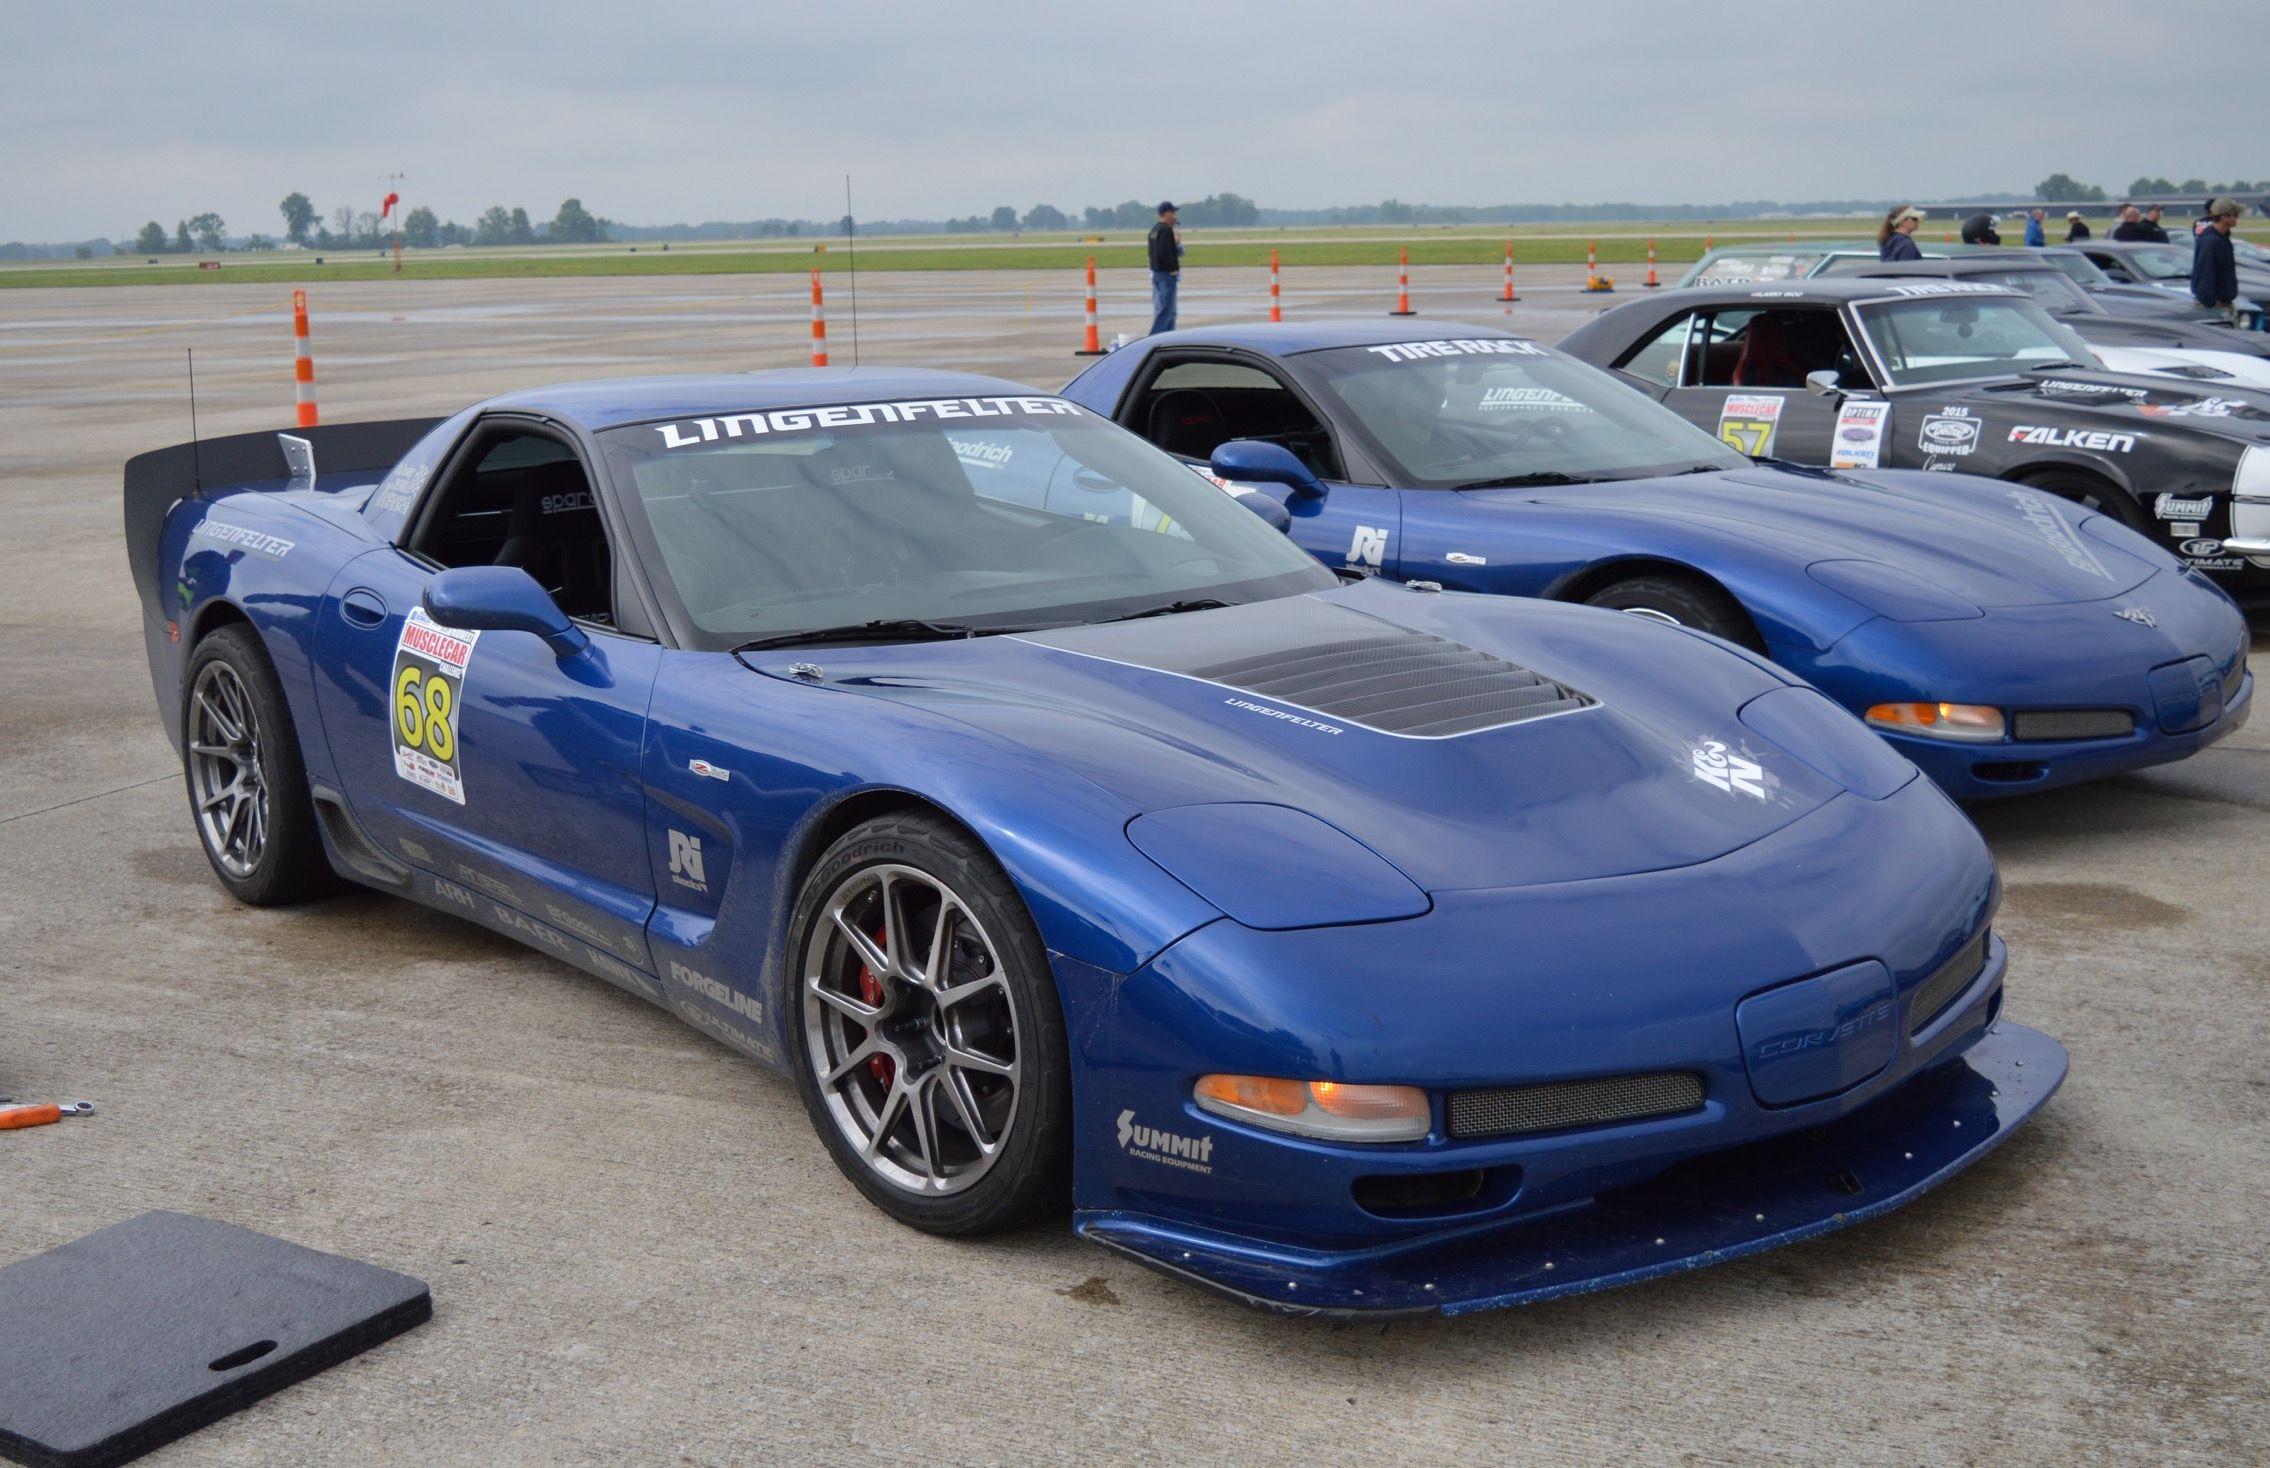 Danny Popp S Raft Motorsports C5 Corvette Z06 Is A Feared Legend It S Powered By A Lingenfelter Ls7 And Rides On Corvette Race Car Corvette Chevrolet Corvette